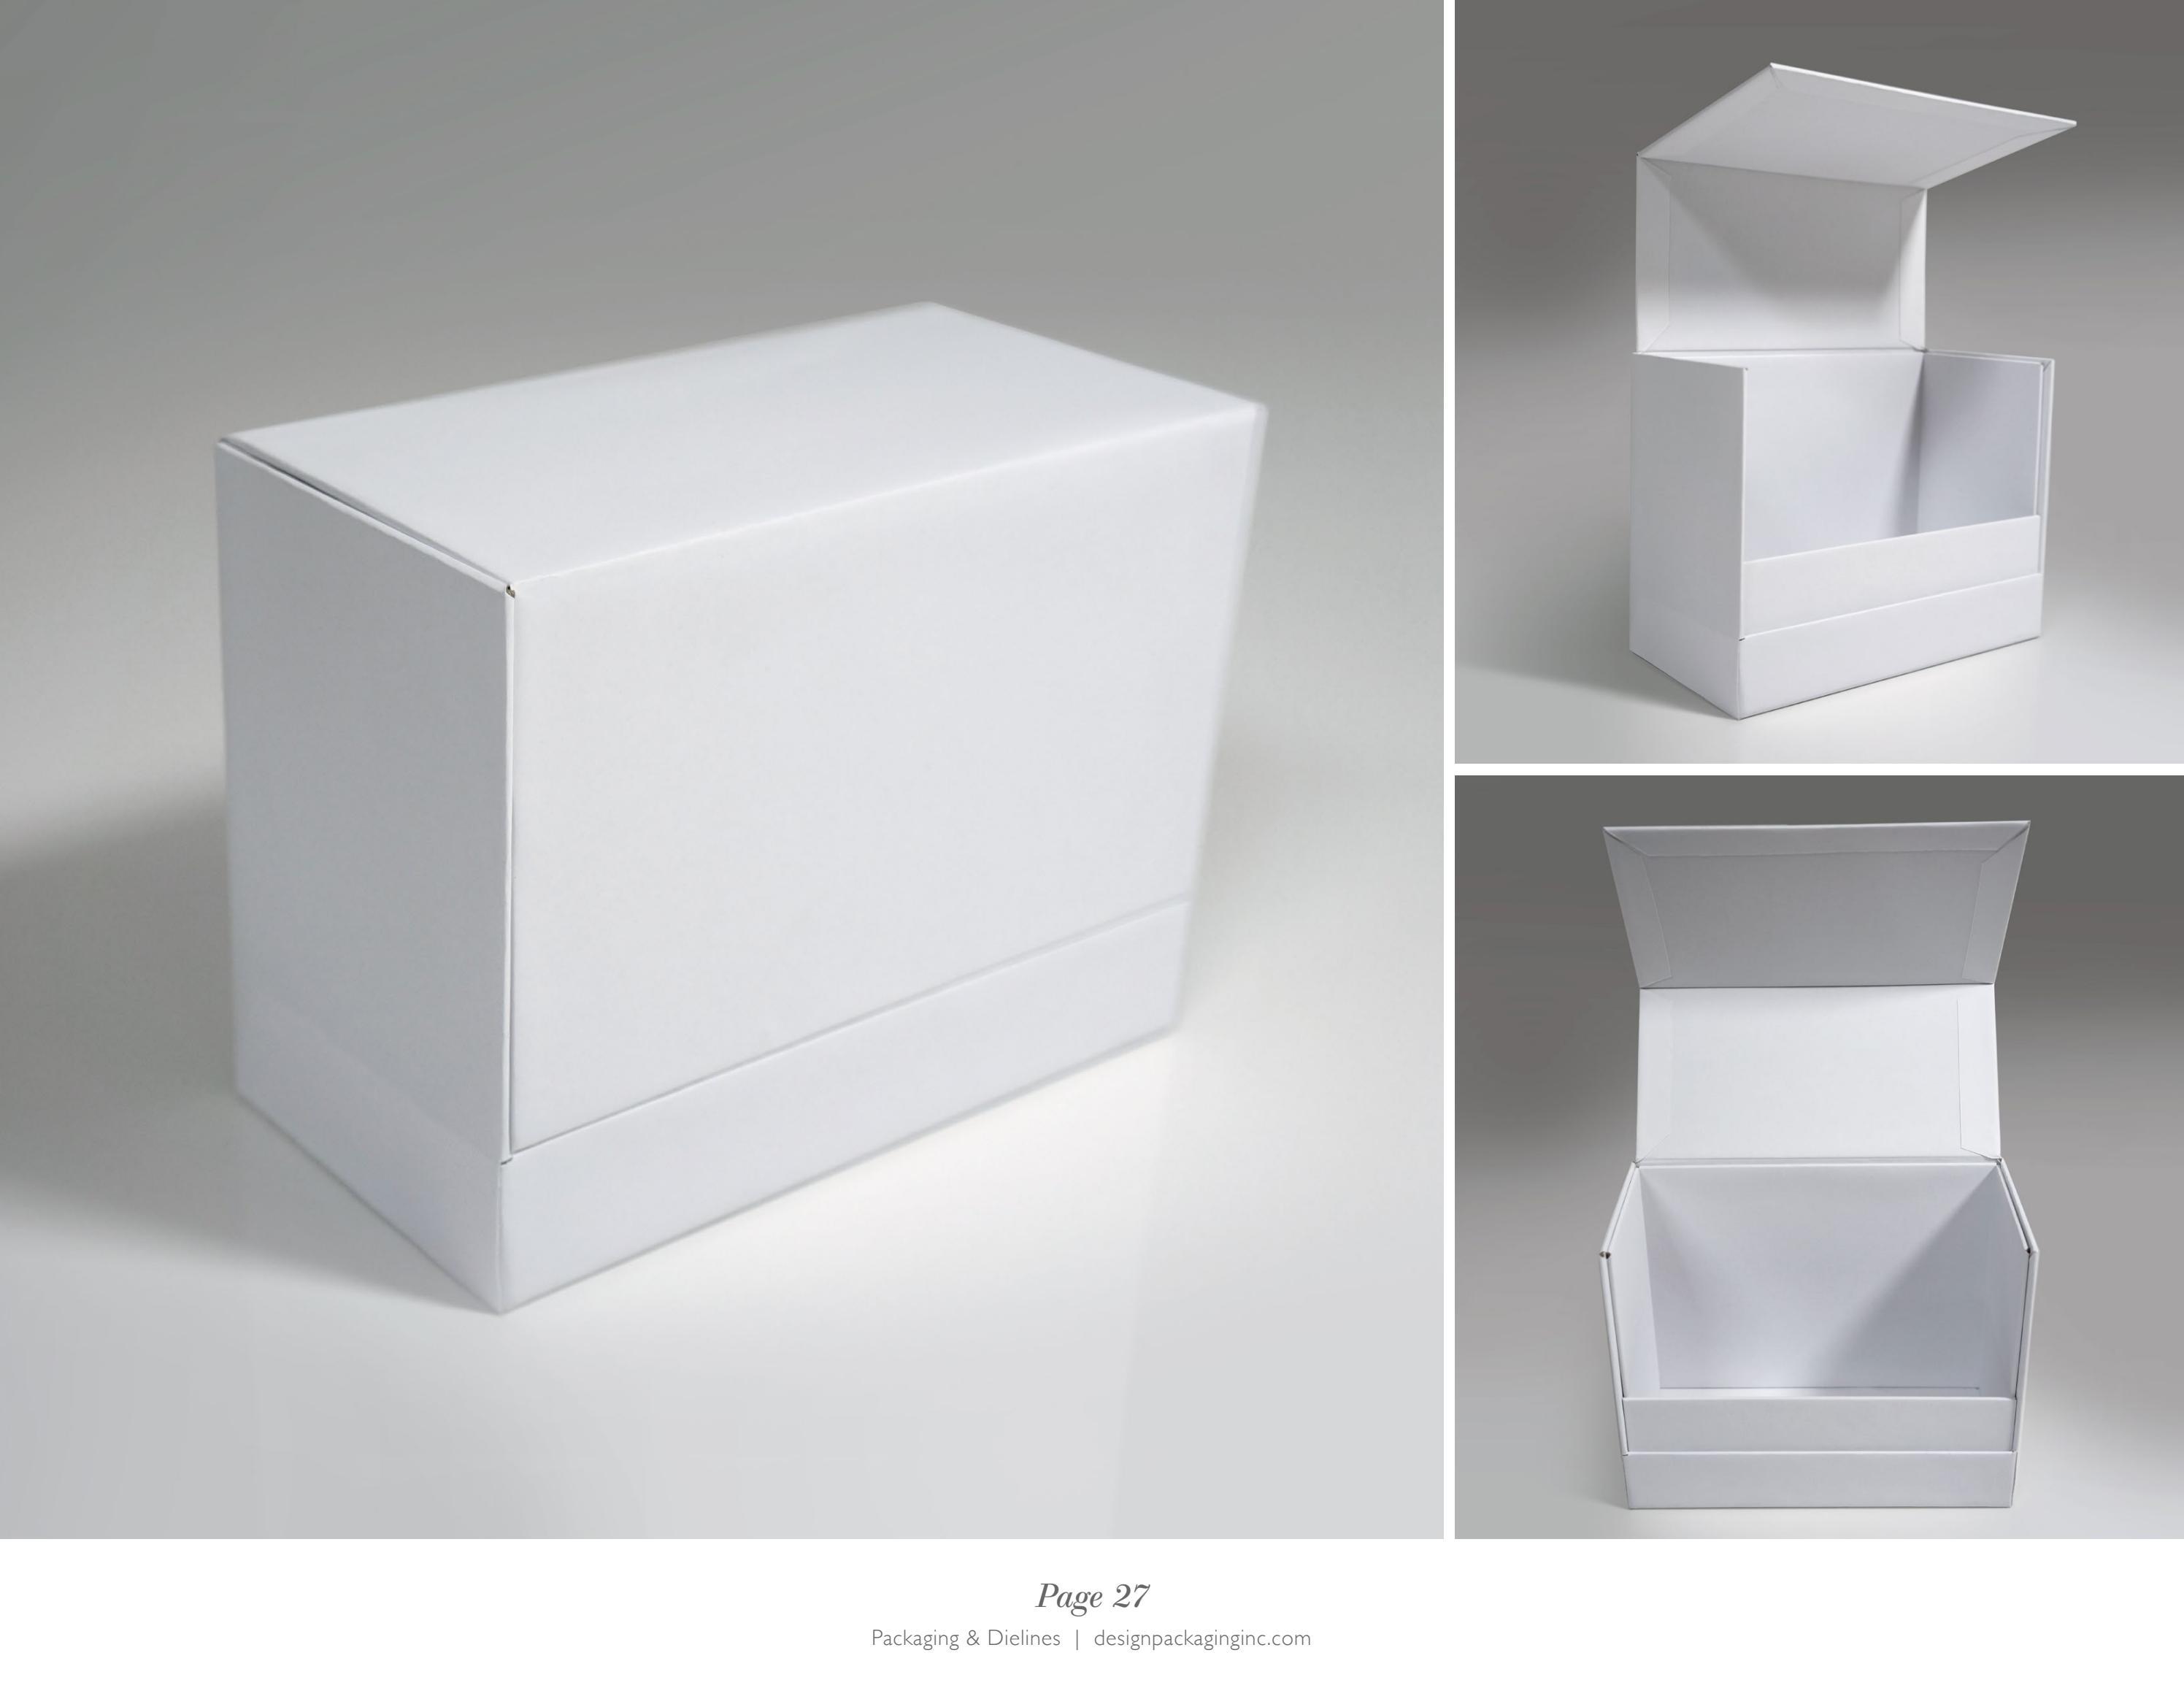 Packaging dielines the designer 39 s book of packaging for Designer s image